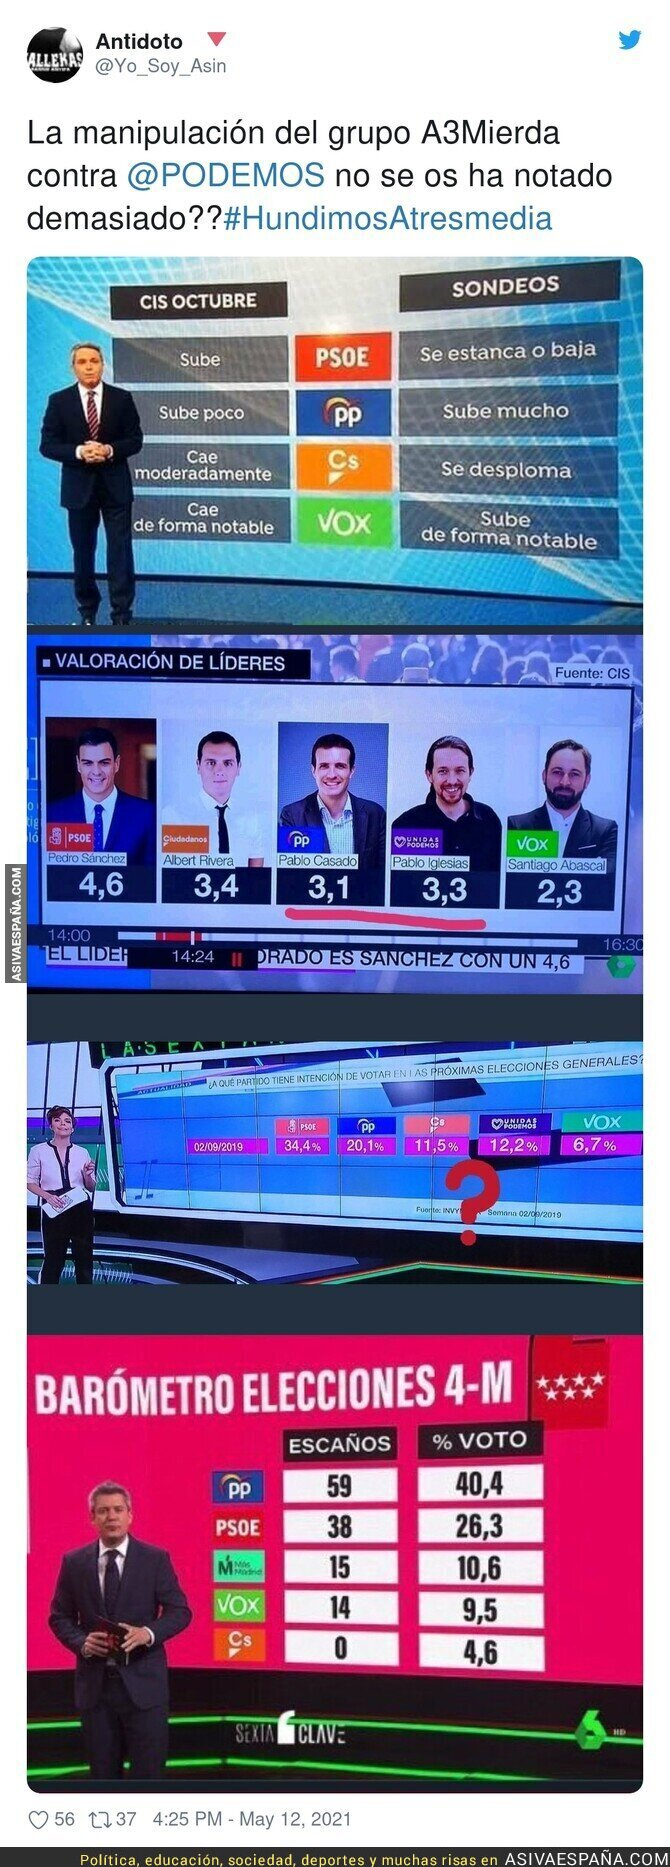 754349 - Todo Atresmedia contra Podemos sin disimular